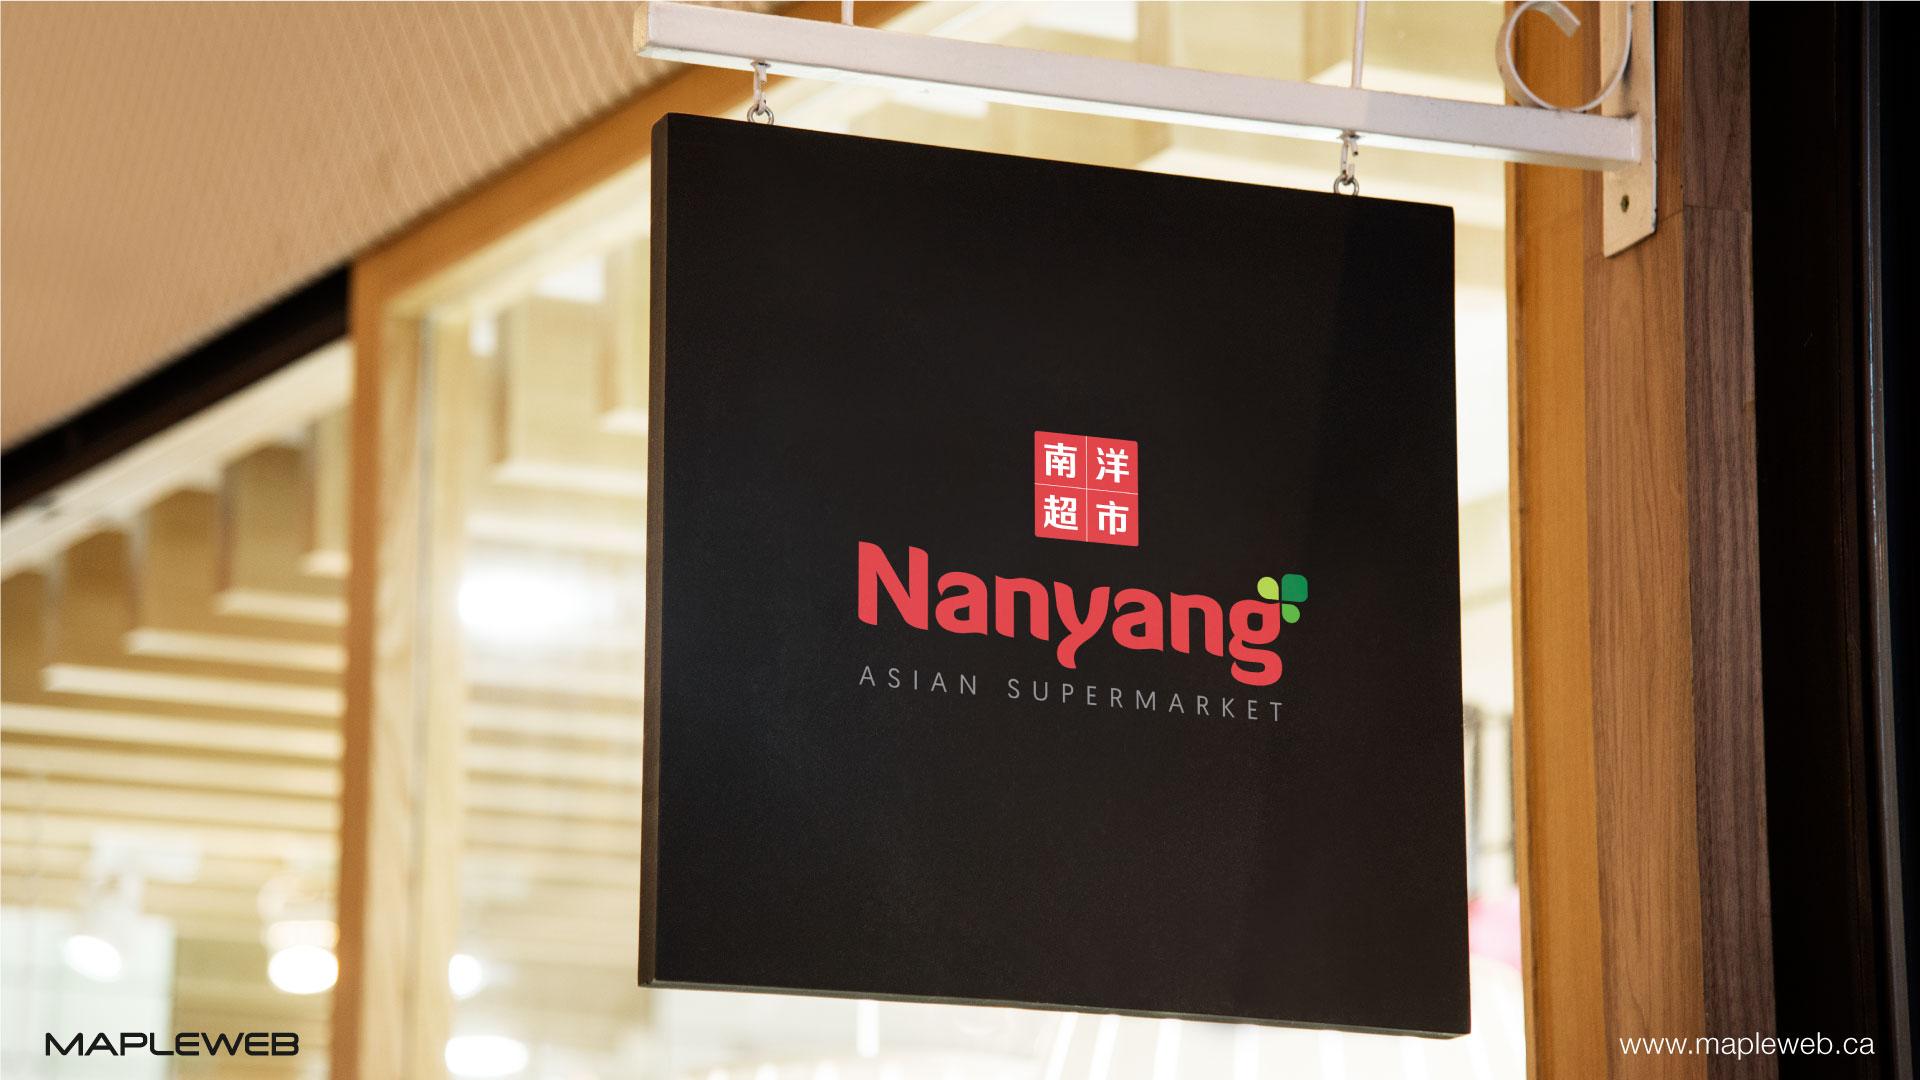 nanyang-logo-design-process-by-mapleweb-vancouver-canada